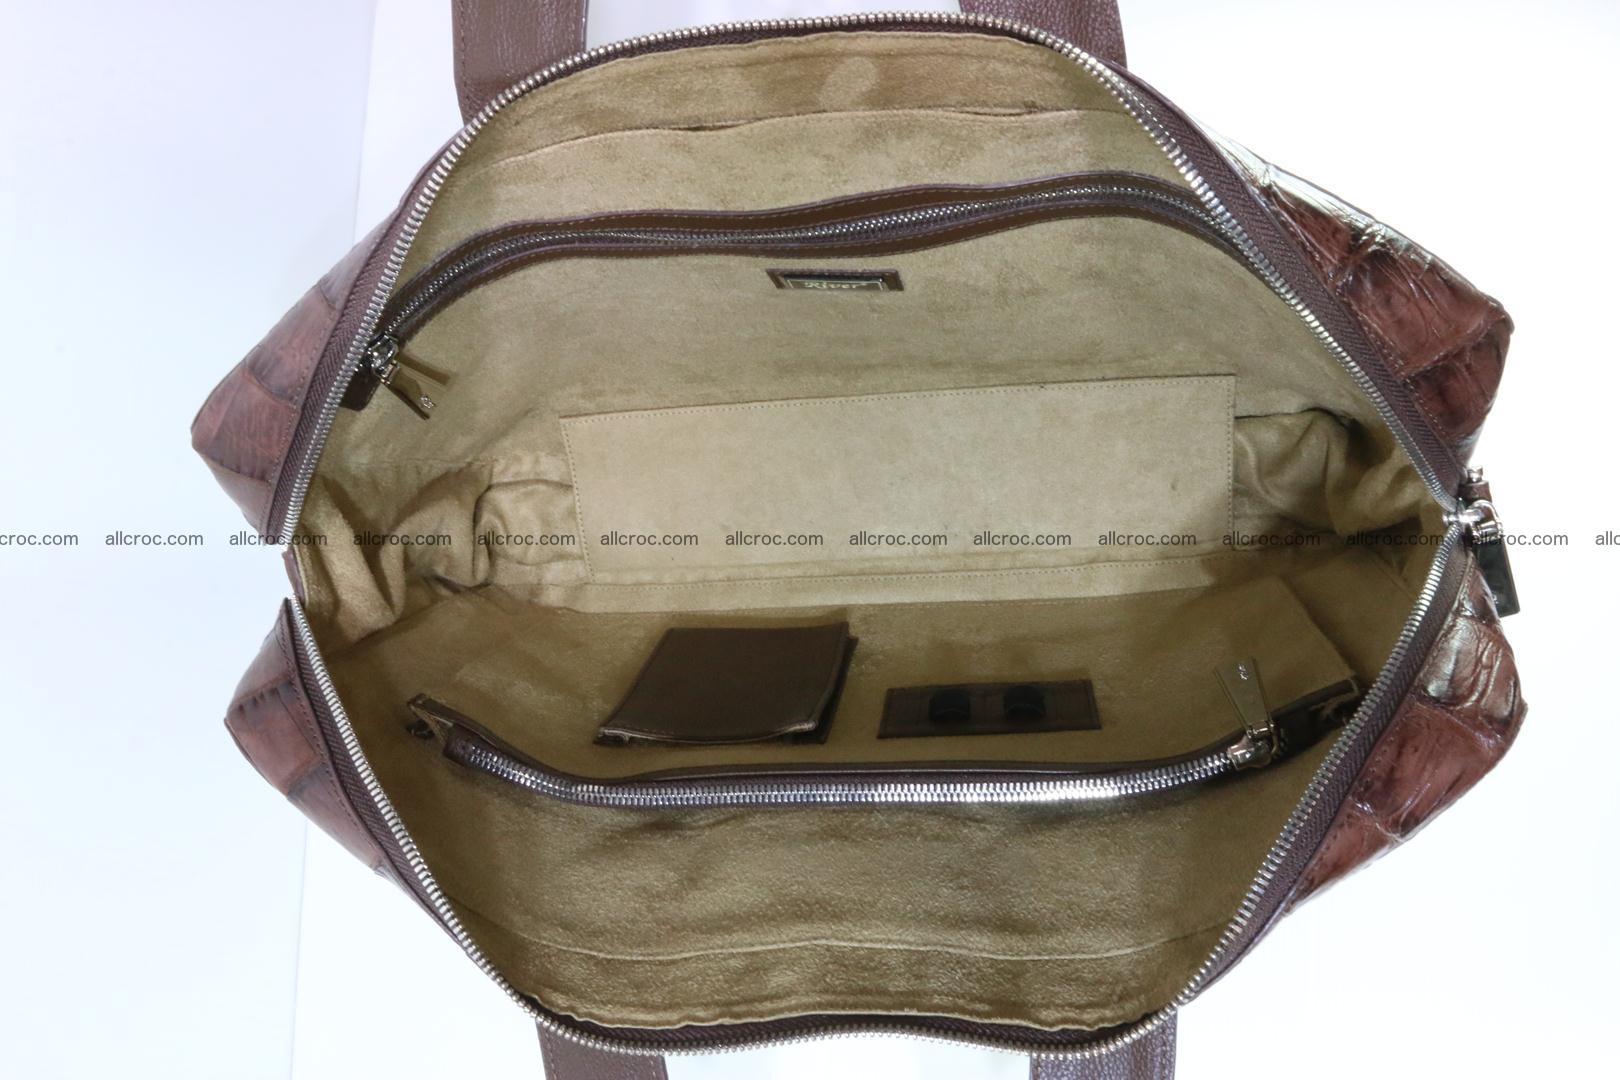 Crocodile skin handbag 126 Foto 14